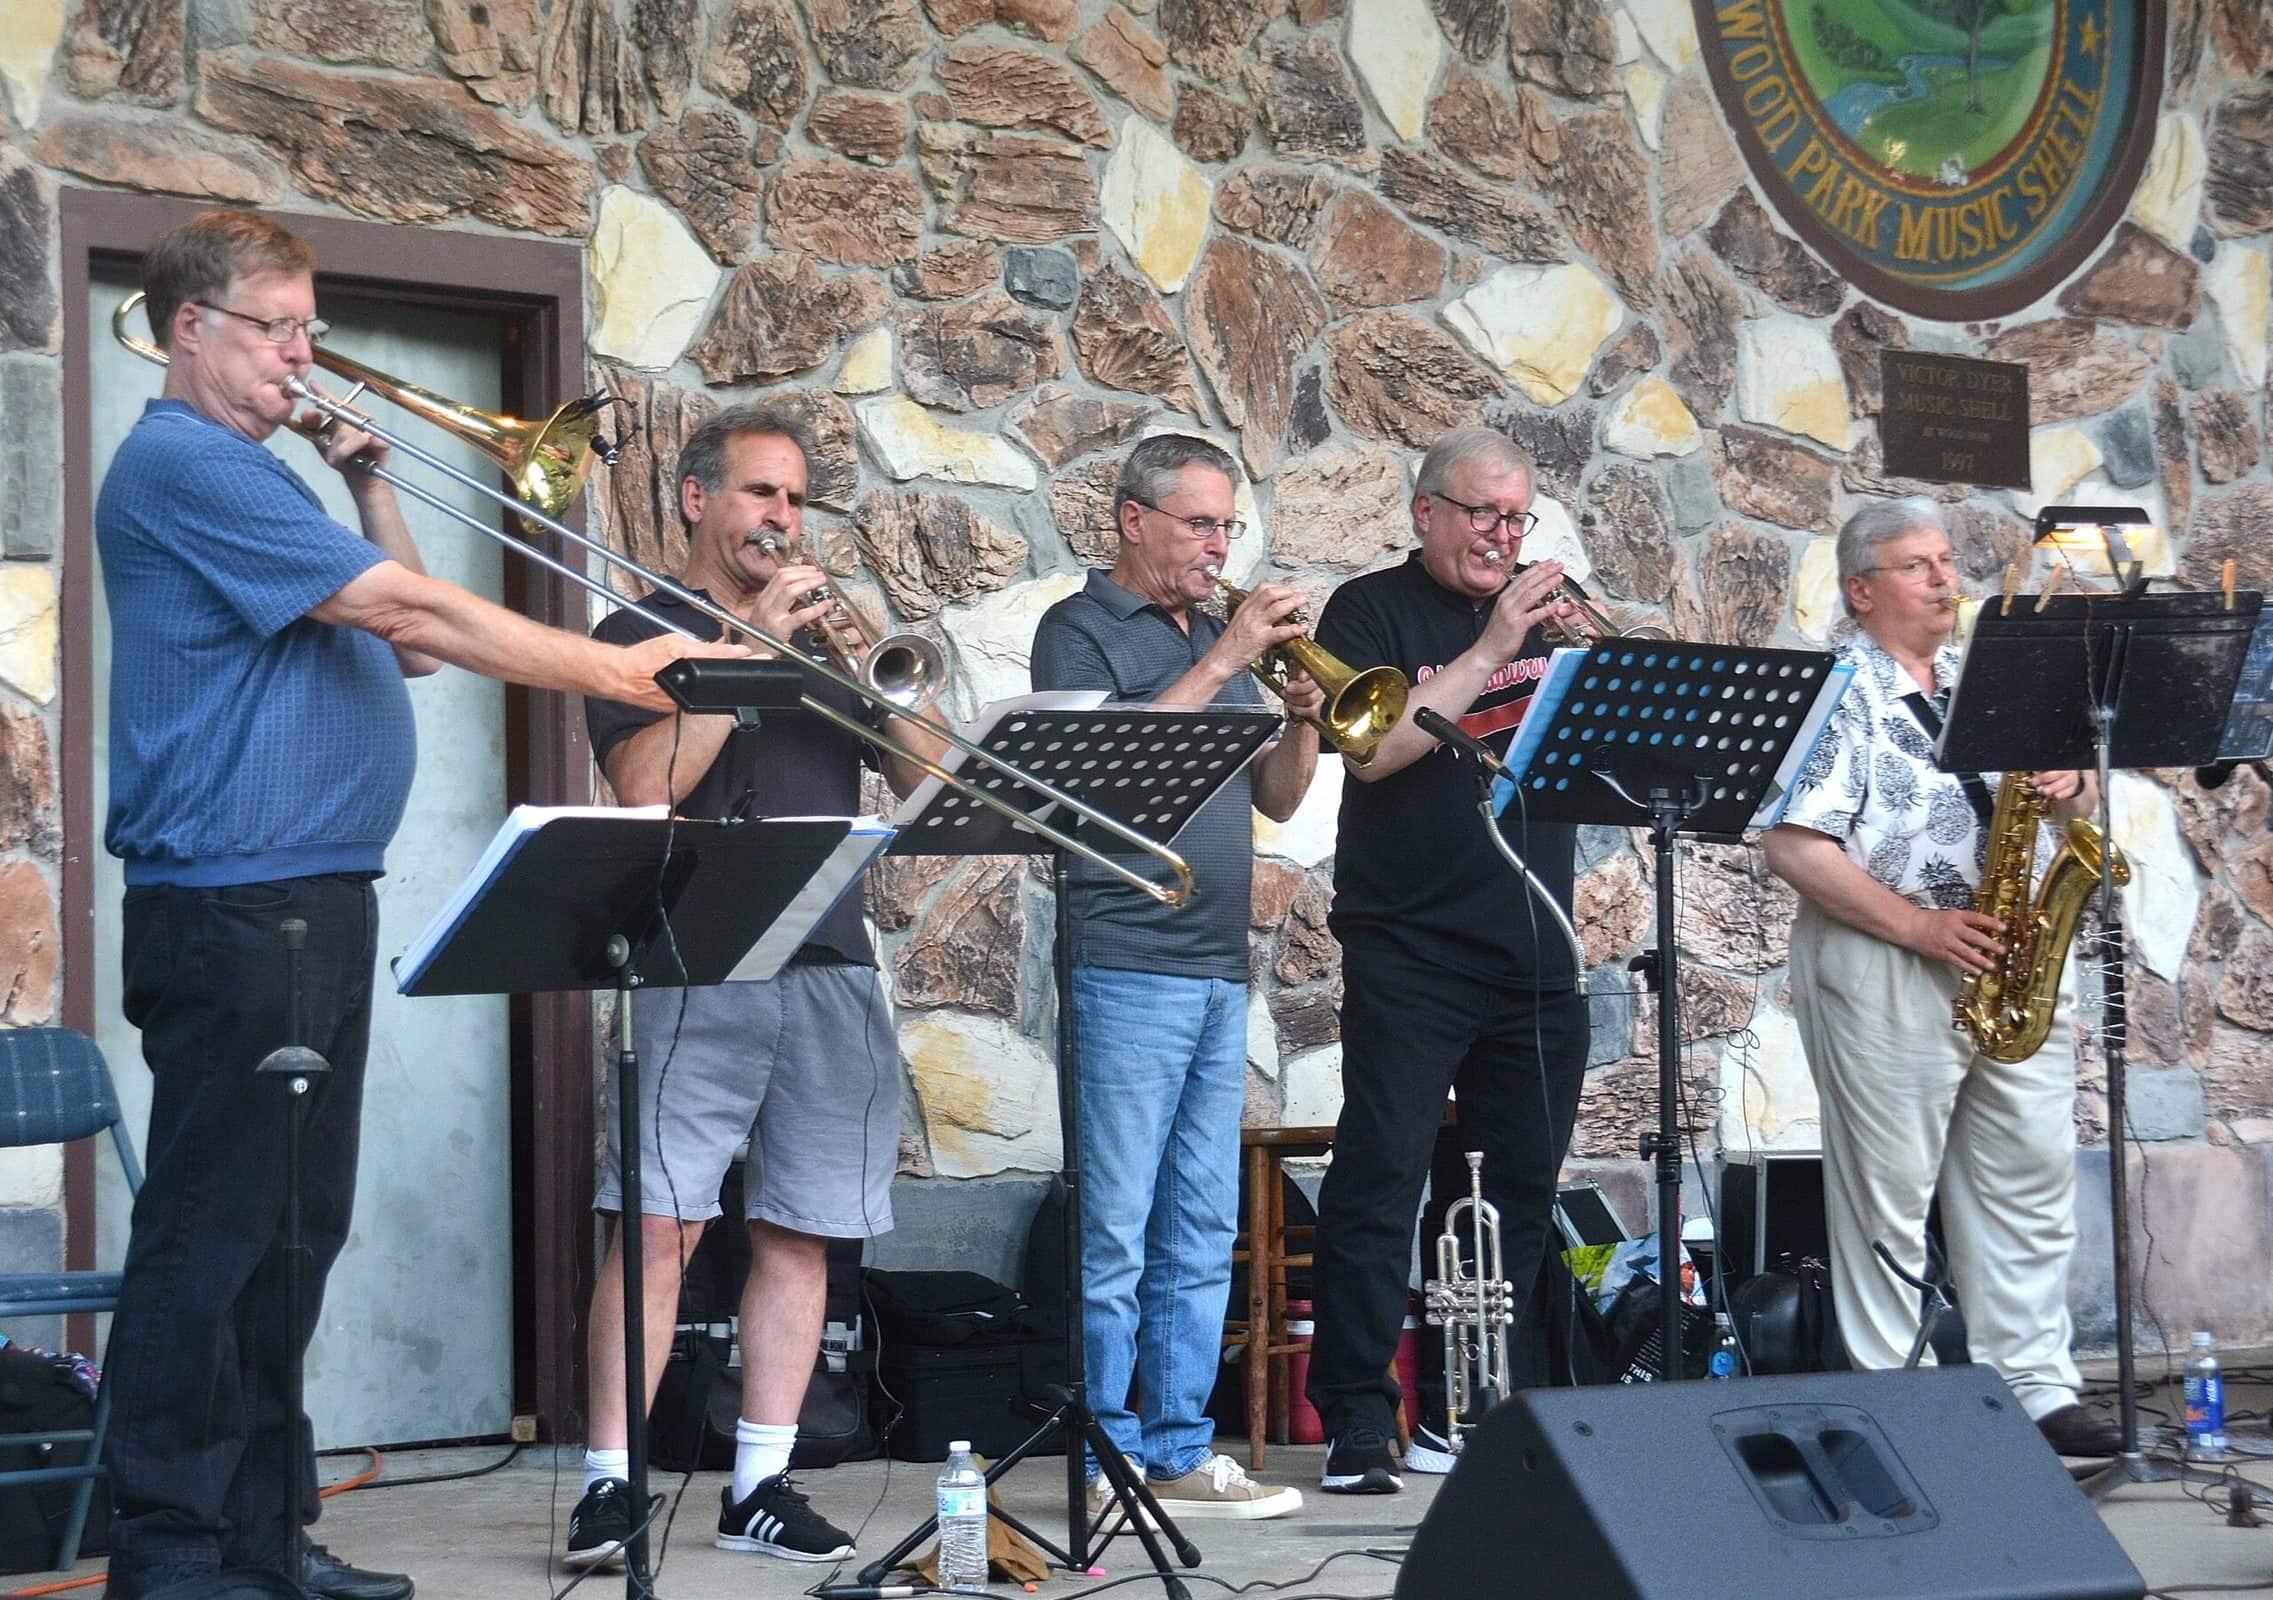 Greg Kojoyian (far left) plays bass alongside vocalists at Hudson's Wood Park Music Shell during The Midtown Horns concert. (Photo/Ed Karvoski Jr.)